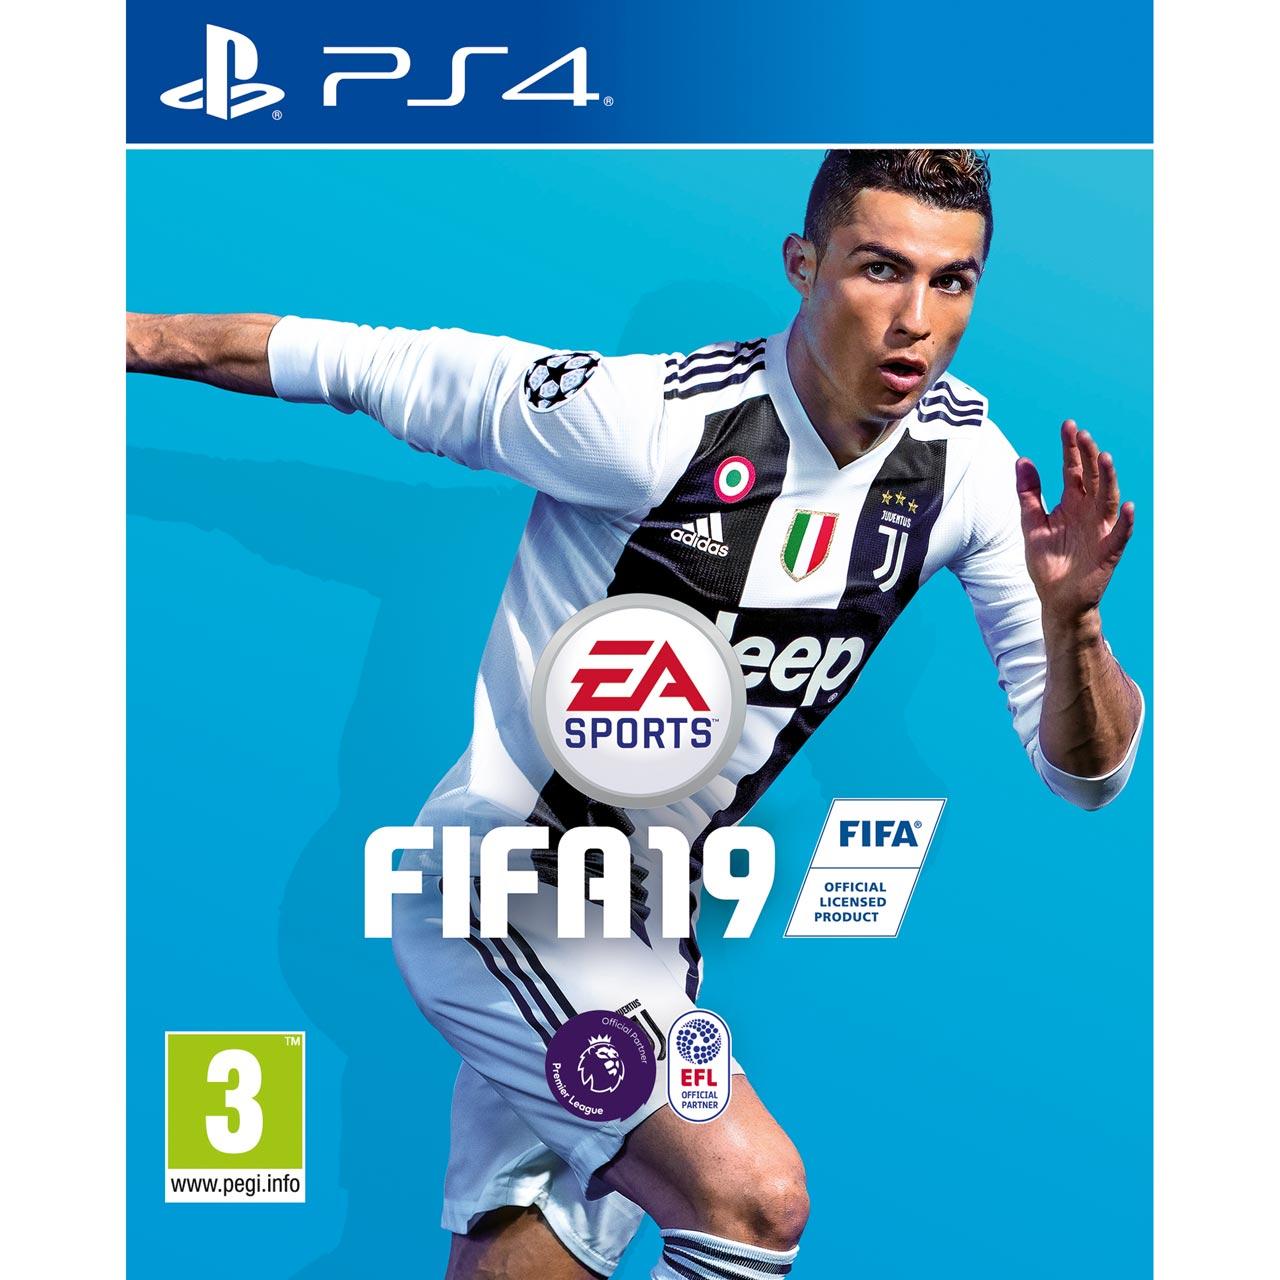 BETTER THAN HALF PRICE! FIFA 19 for PS4 £28 ao.com